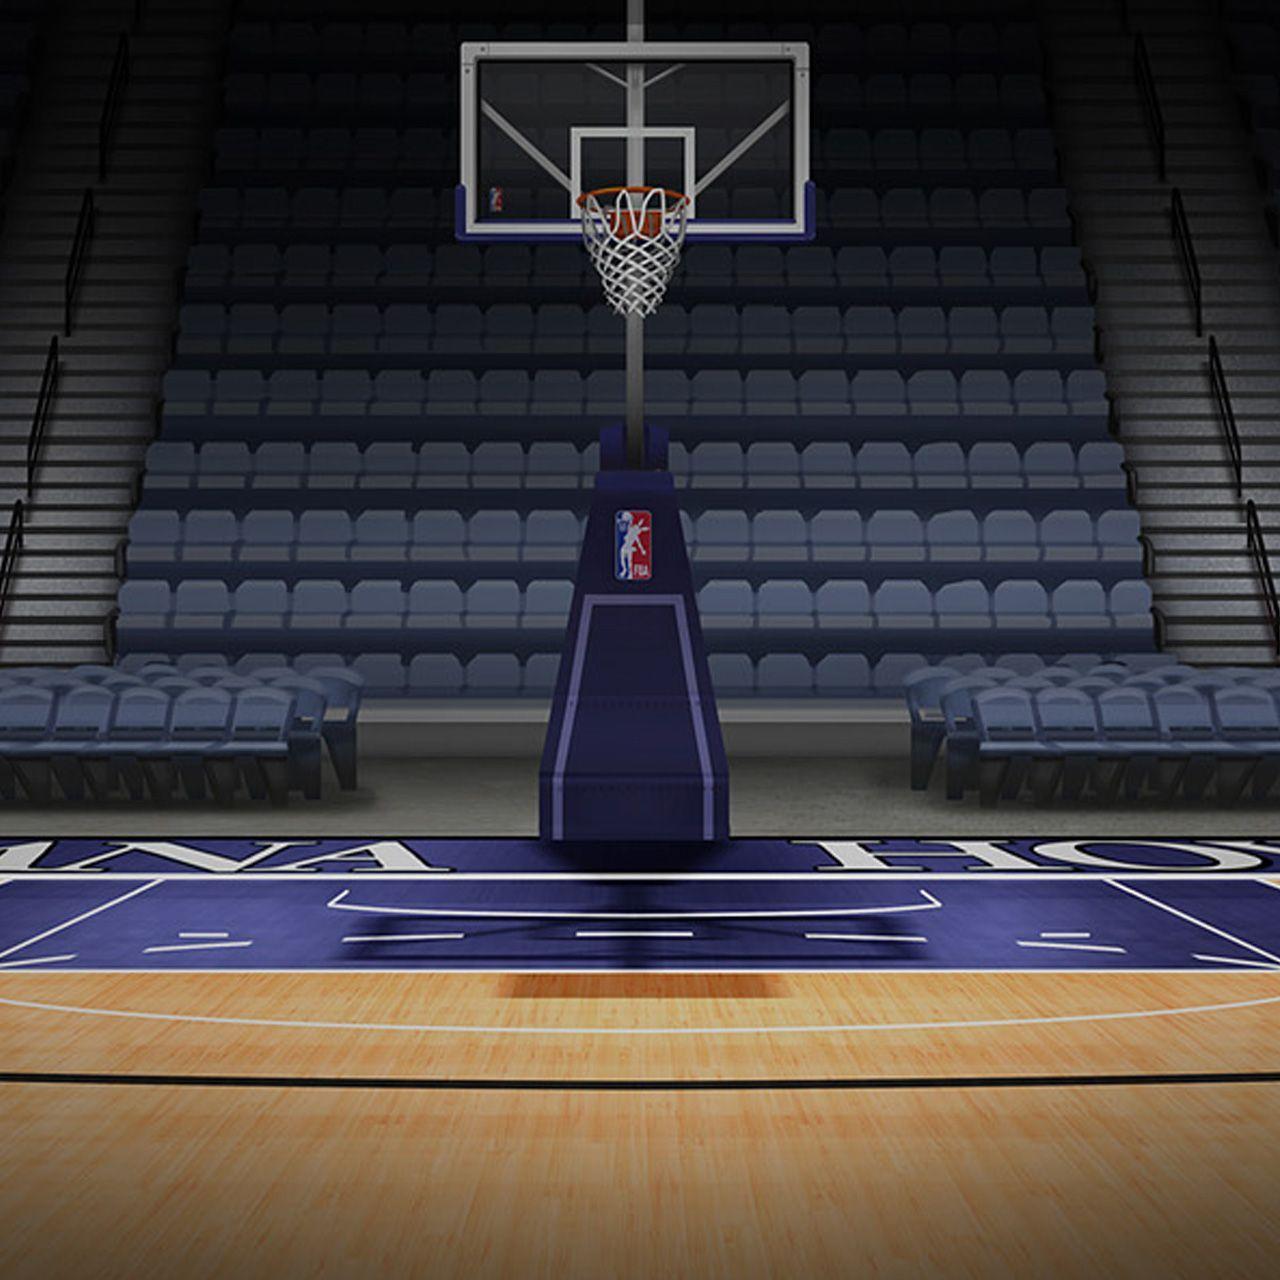 Basketball Court Wallpapers Hd